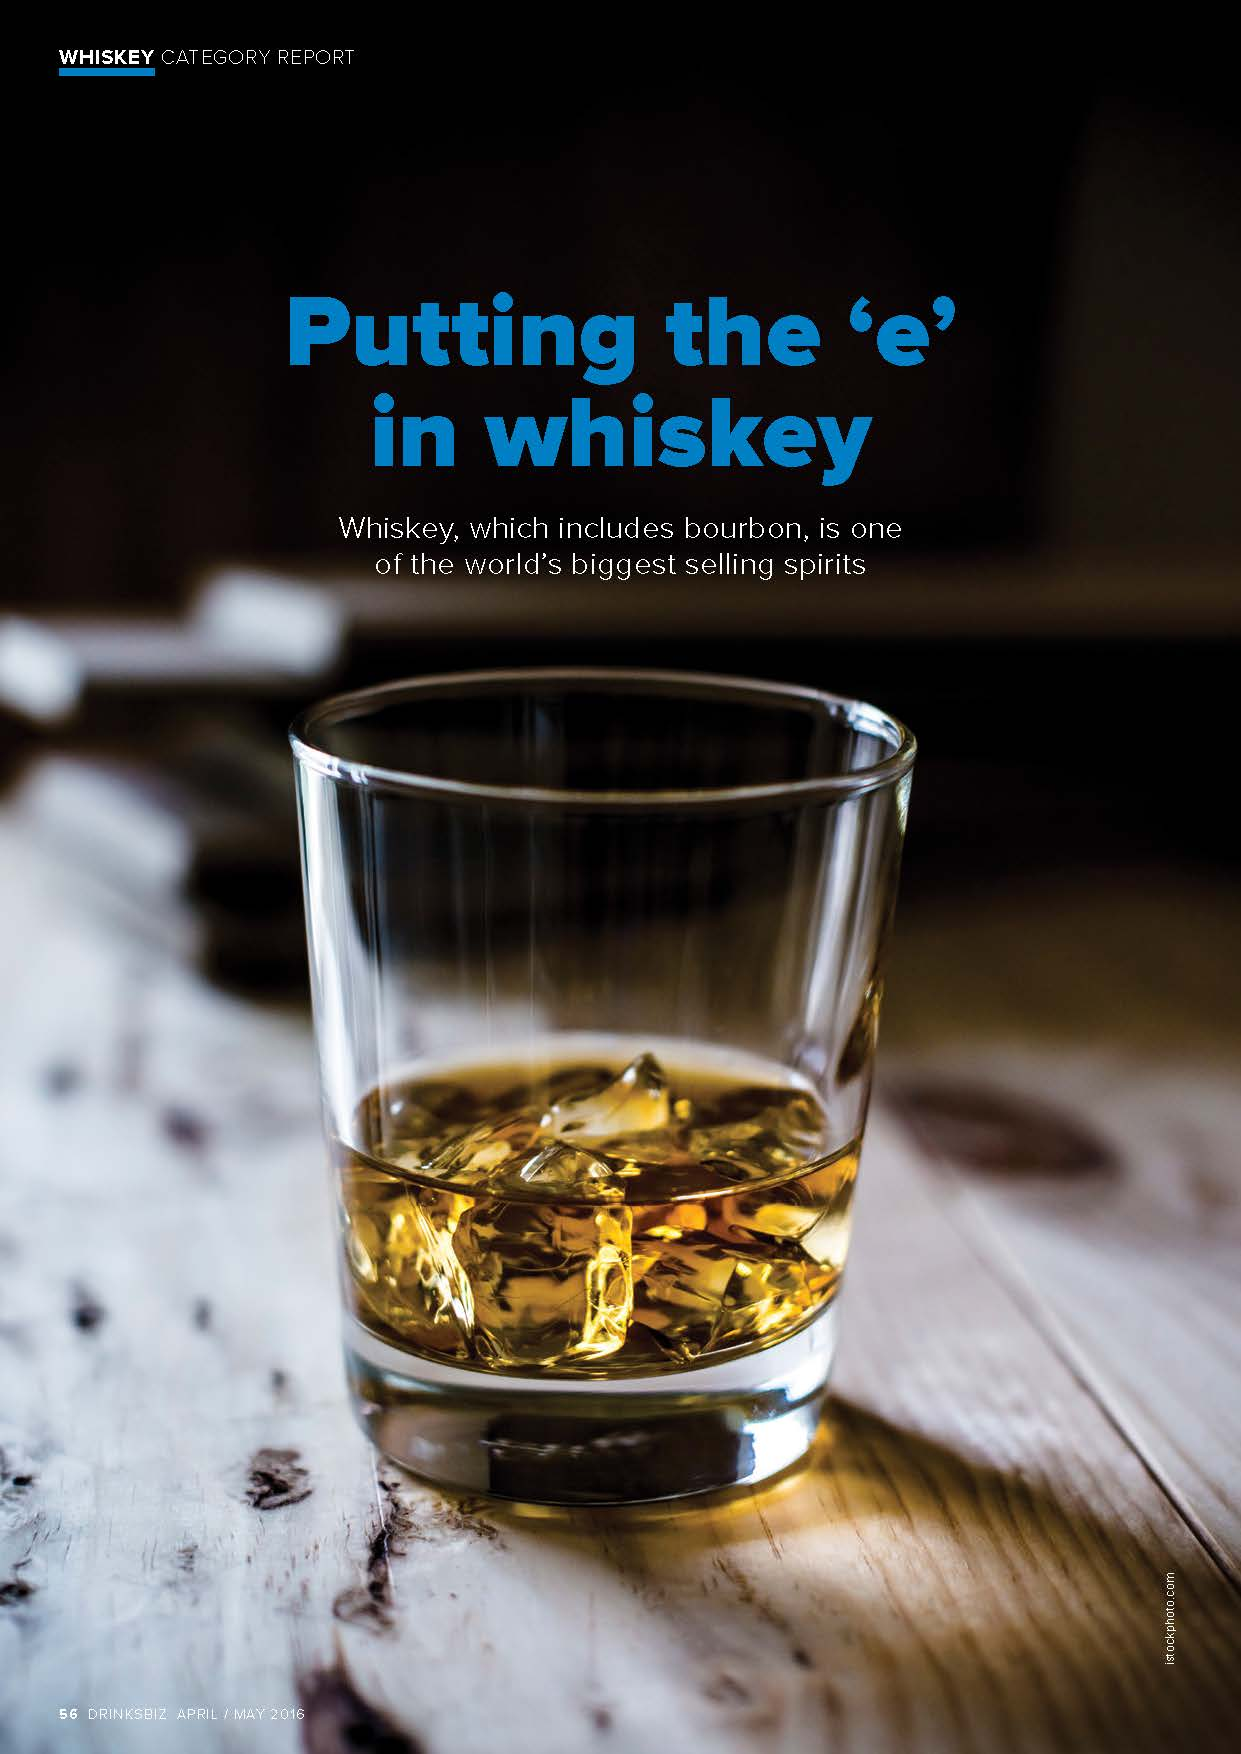 whiskey_Page_1.jpg